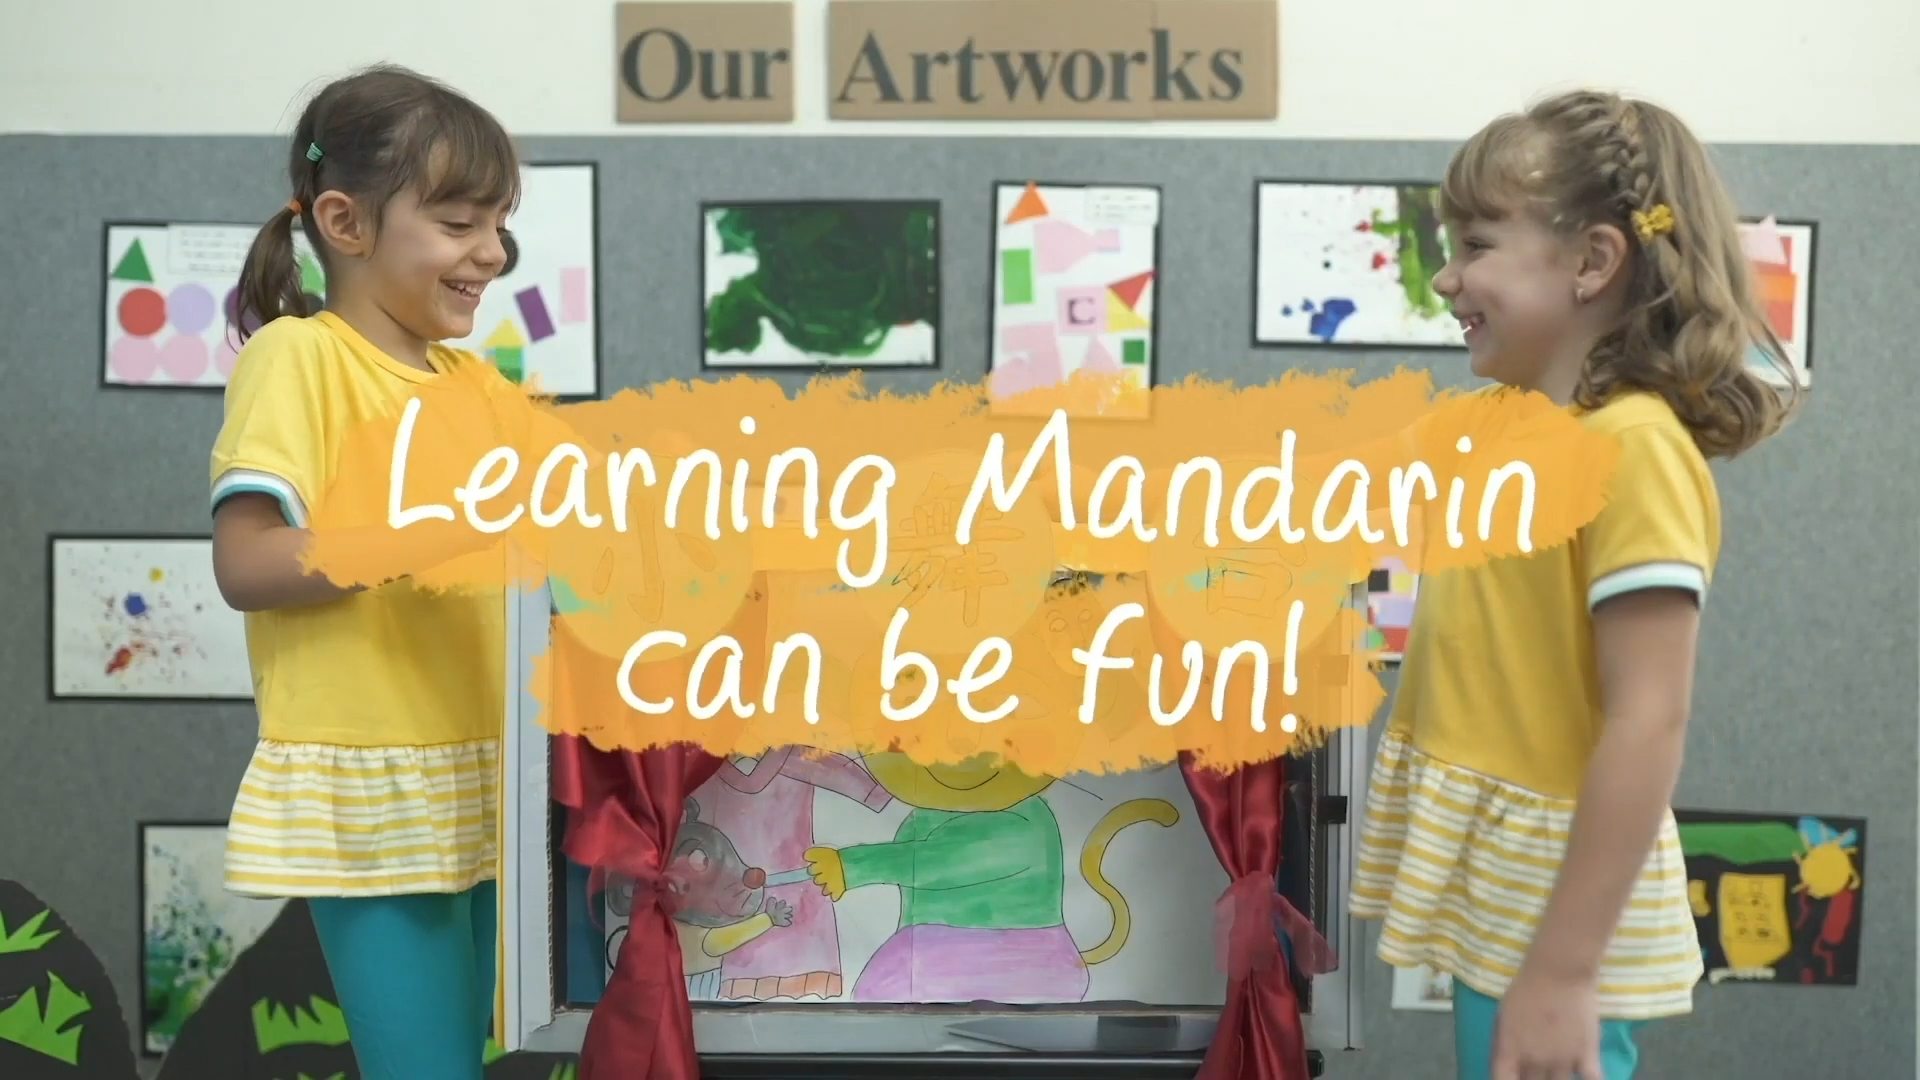 Mandarin as a second language!